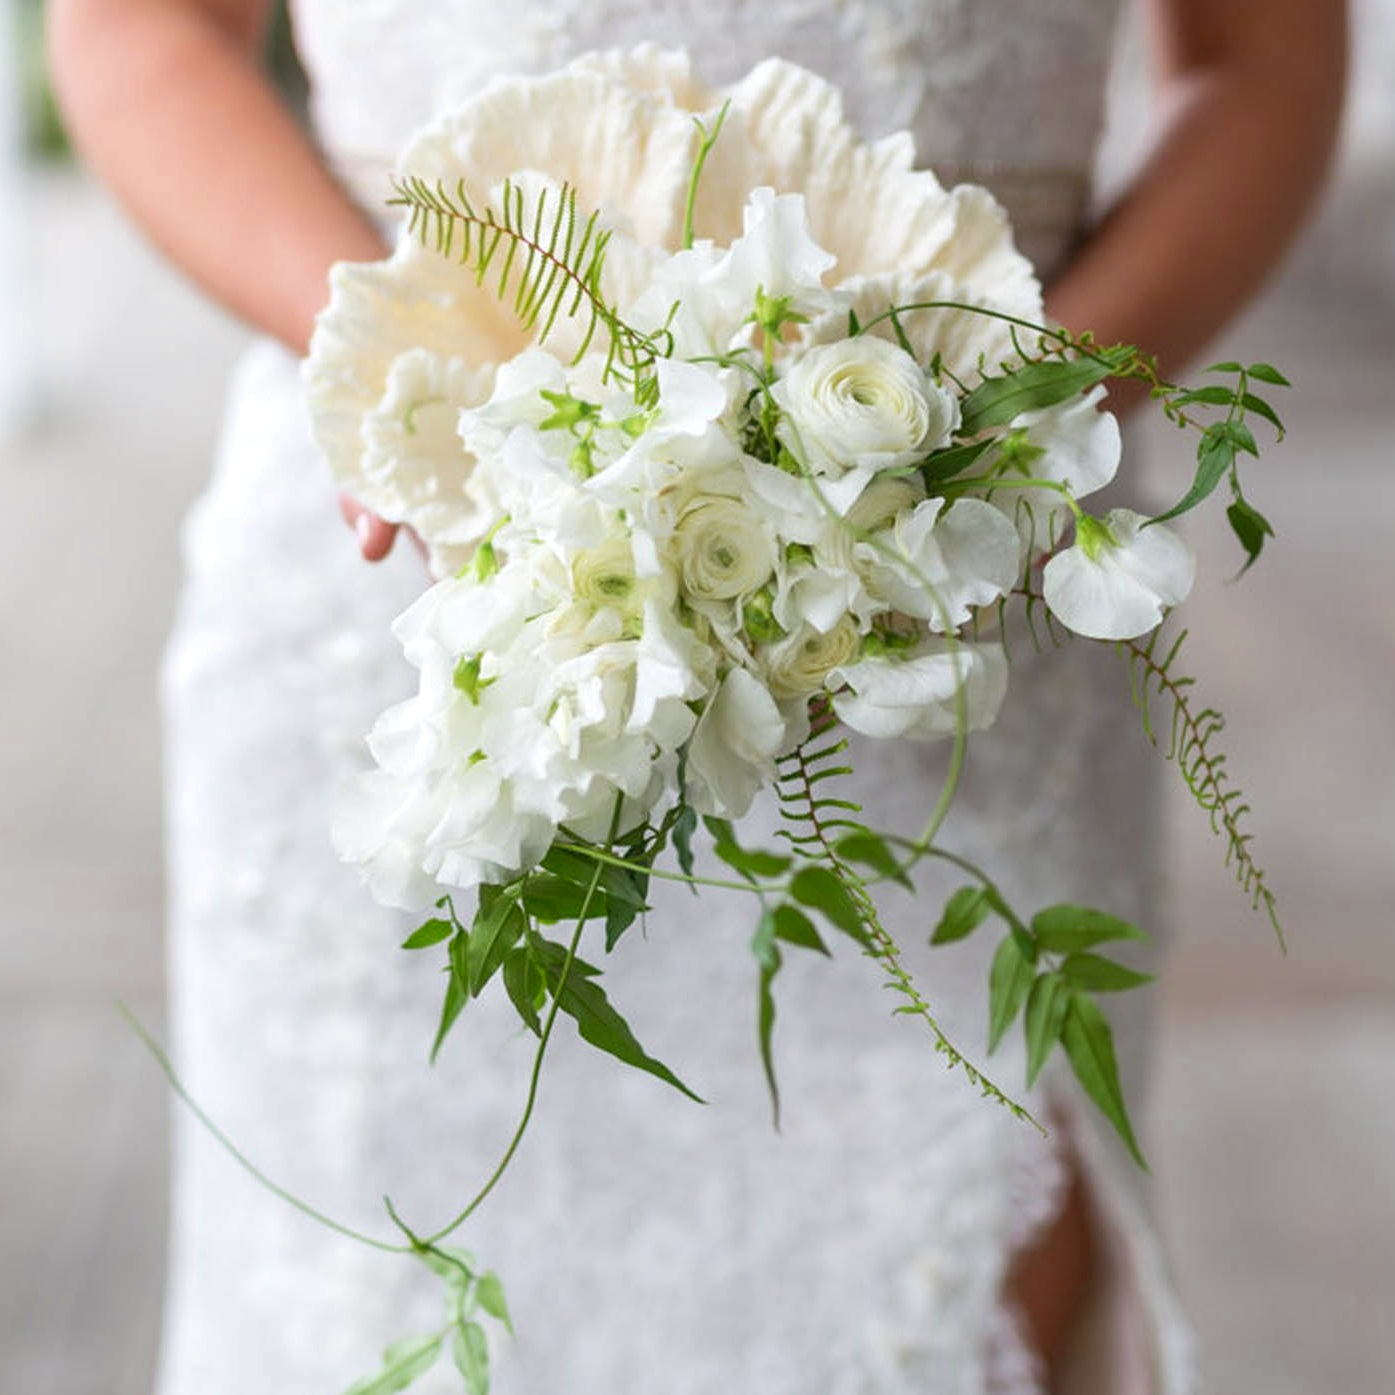 lilacs-florals-wedding-florist-bouquets-hires-024.jpg